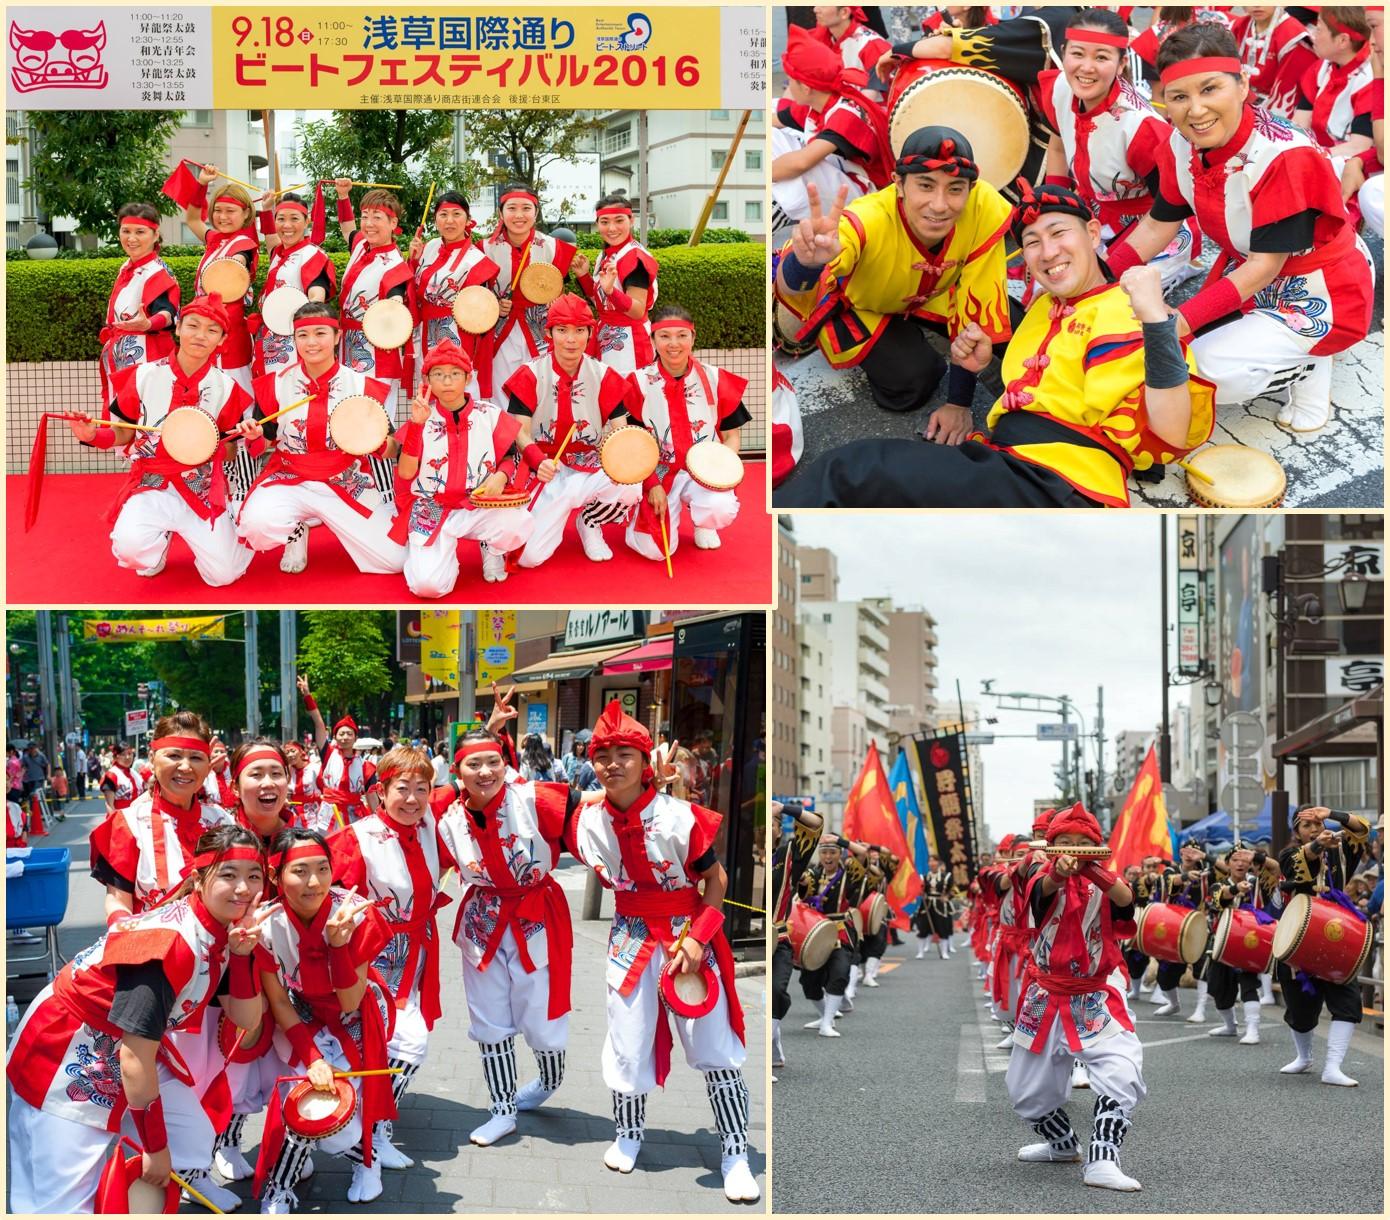 MO-LEシーサーズ2016_2 by 昇龍祭太鼓